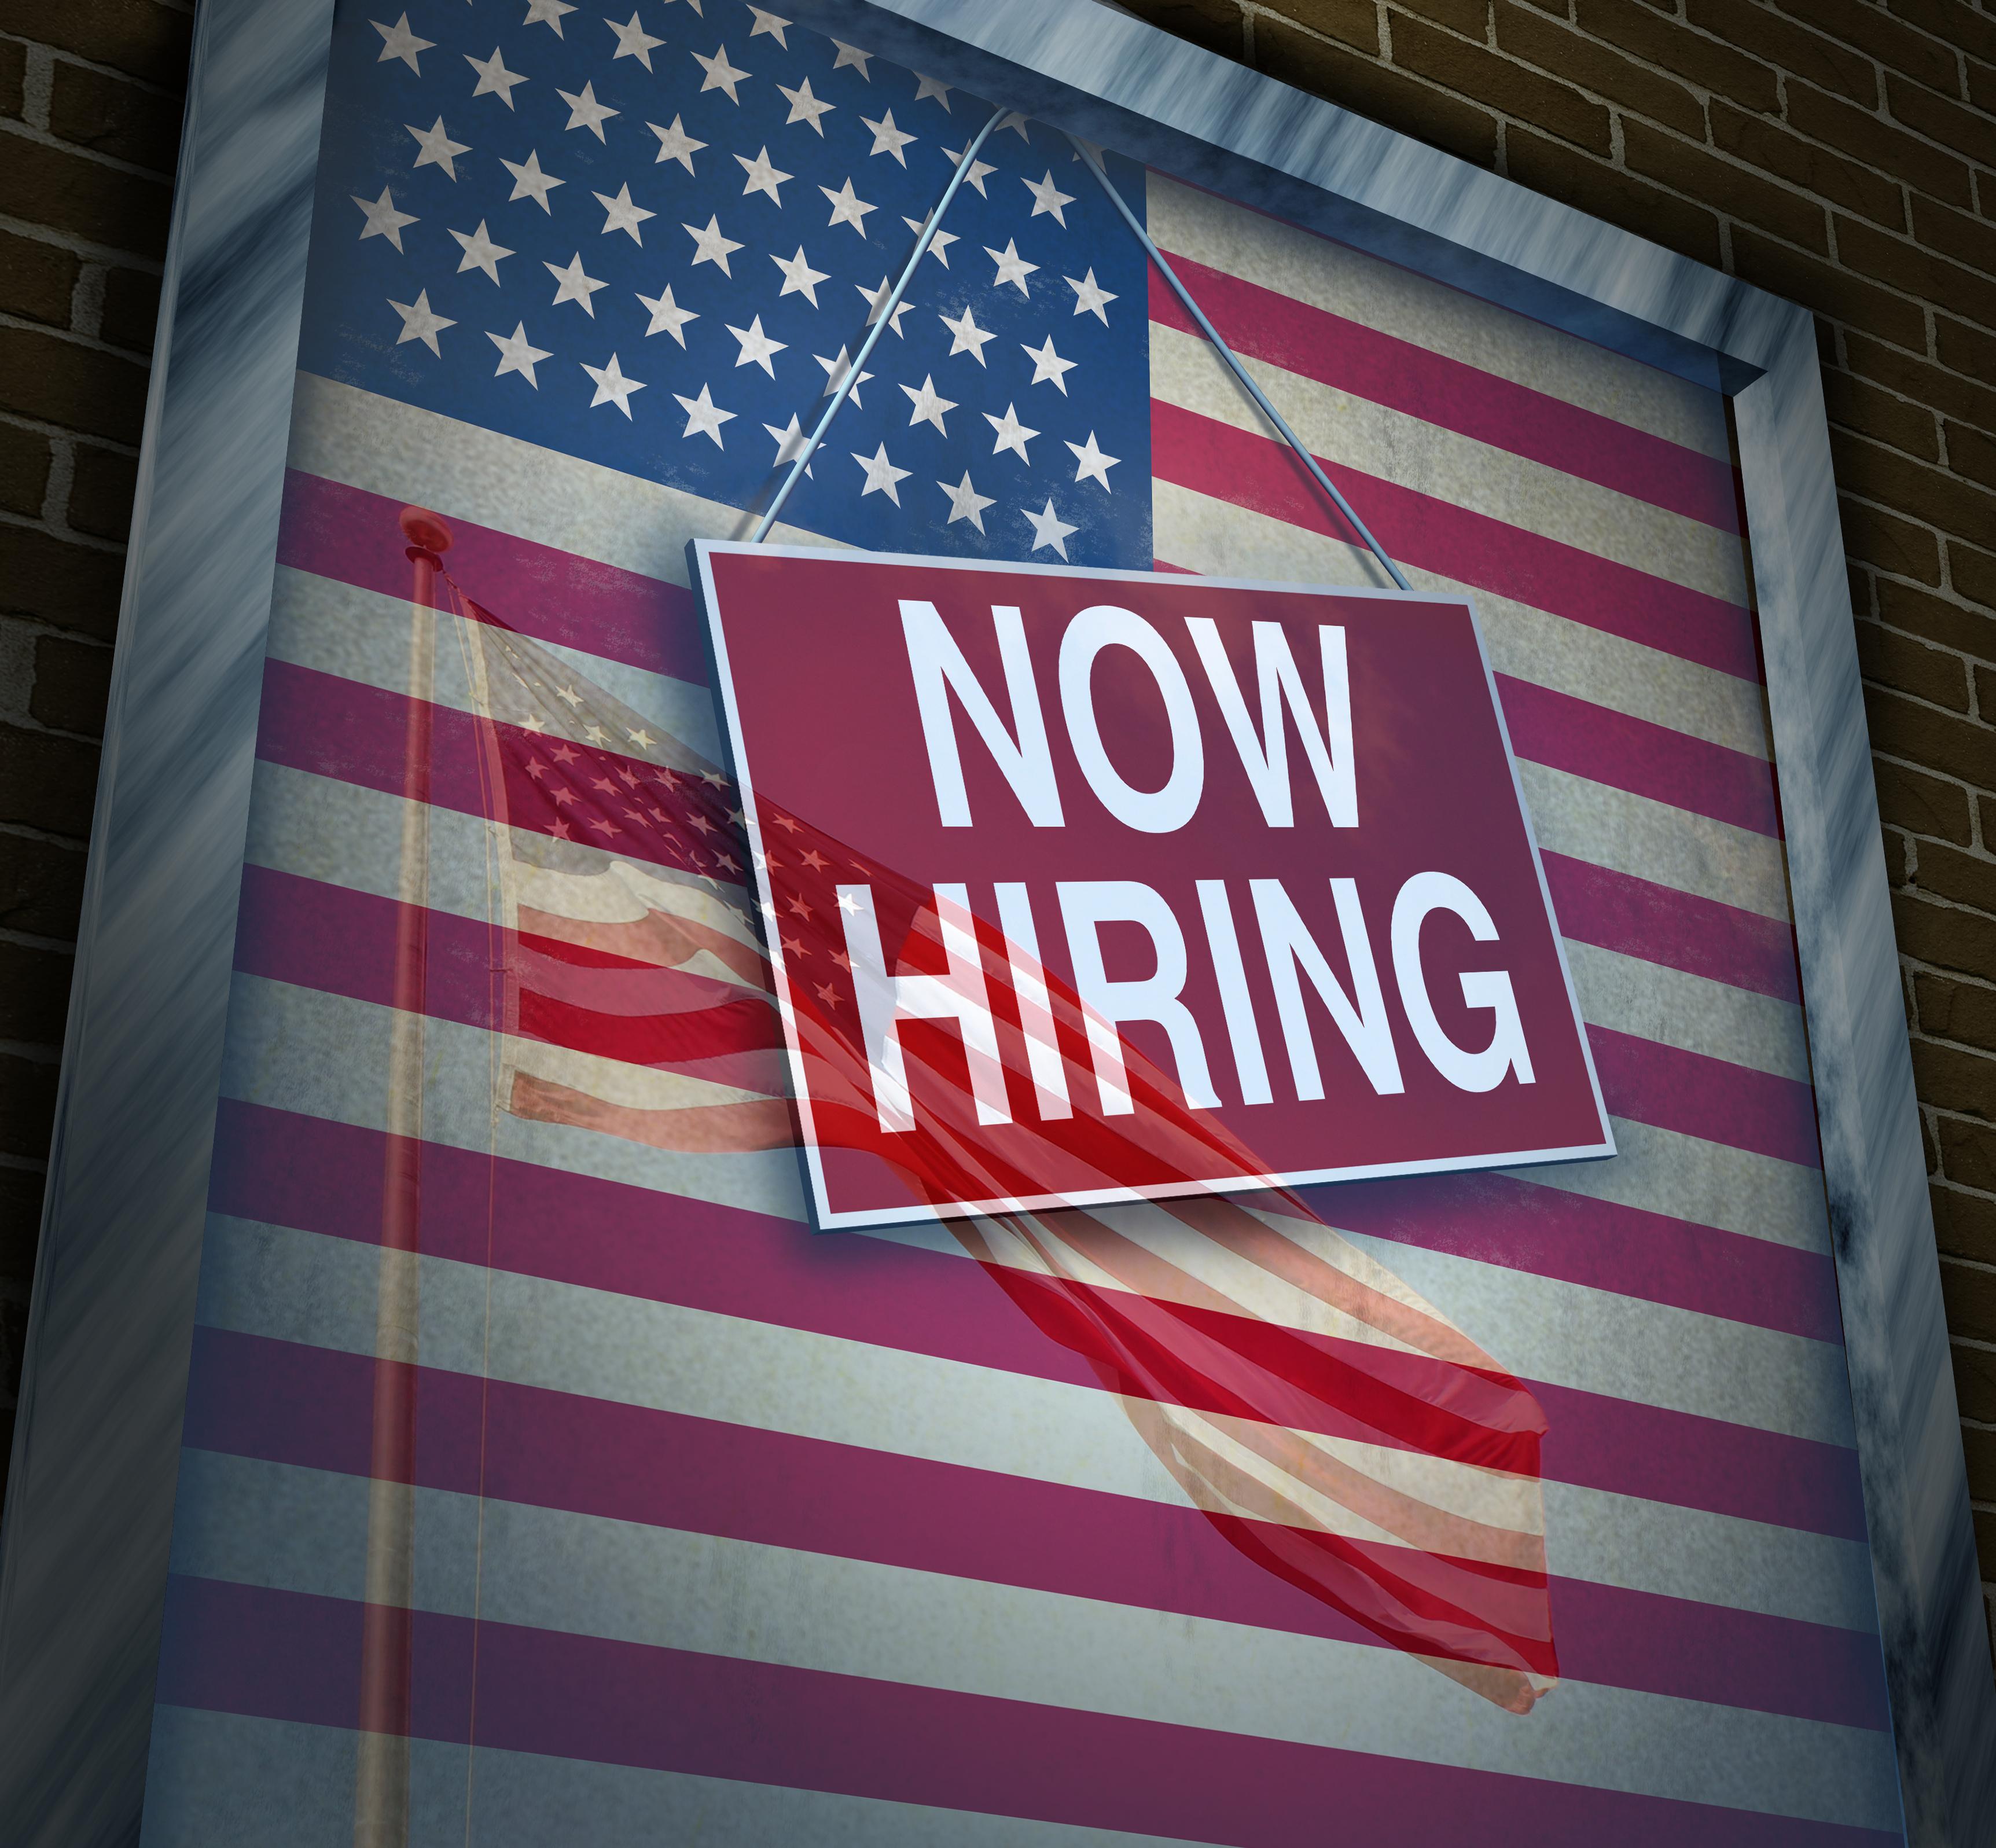 Cancelan aumentos a trabajadores federales